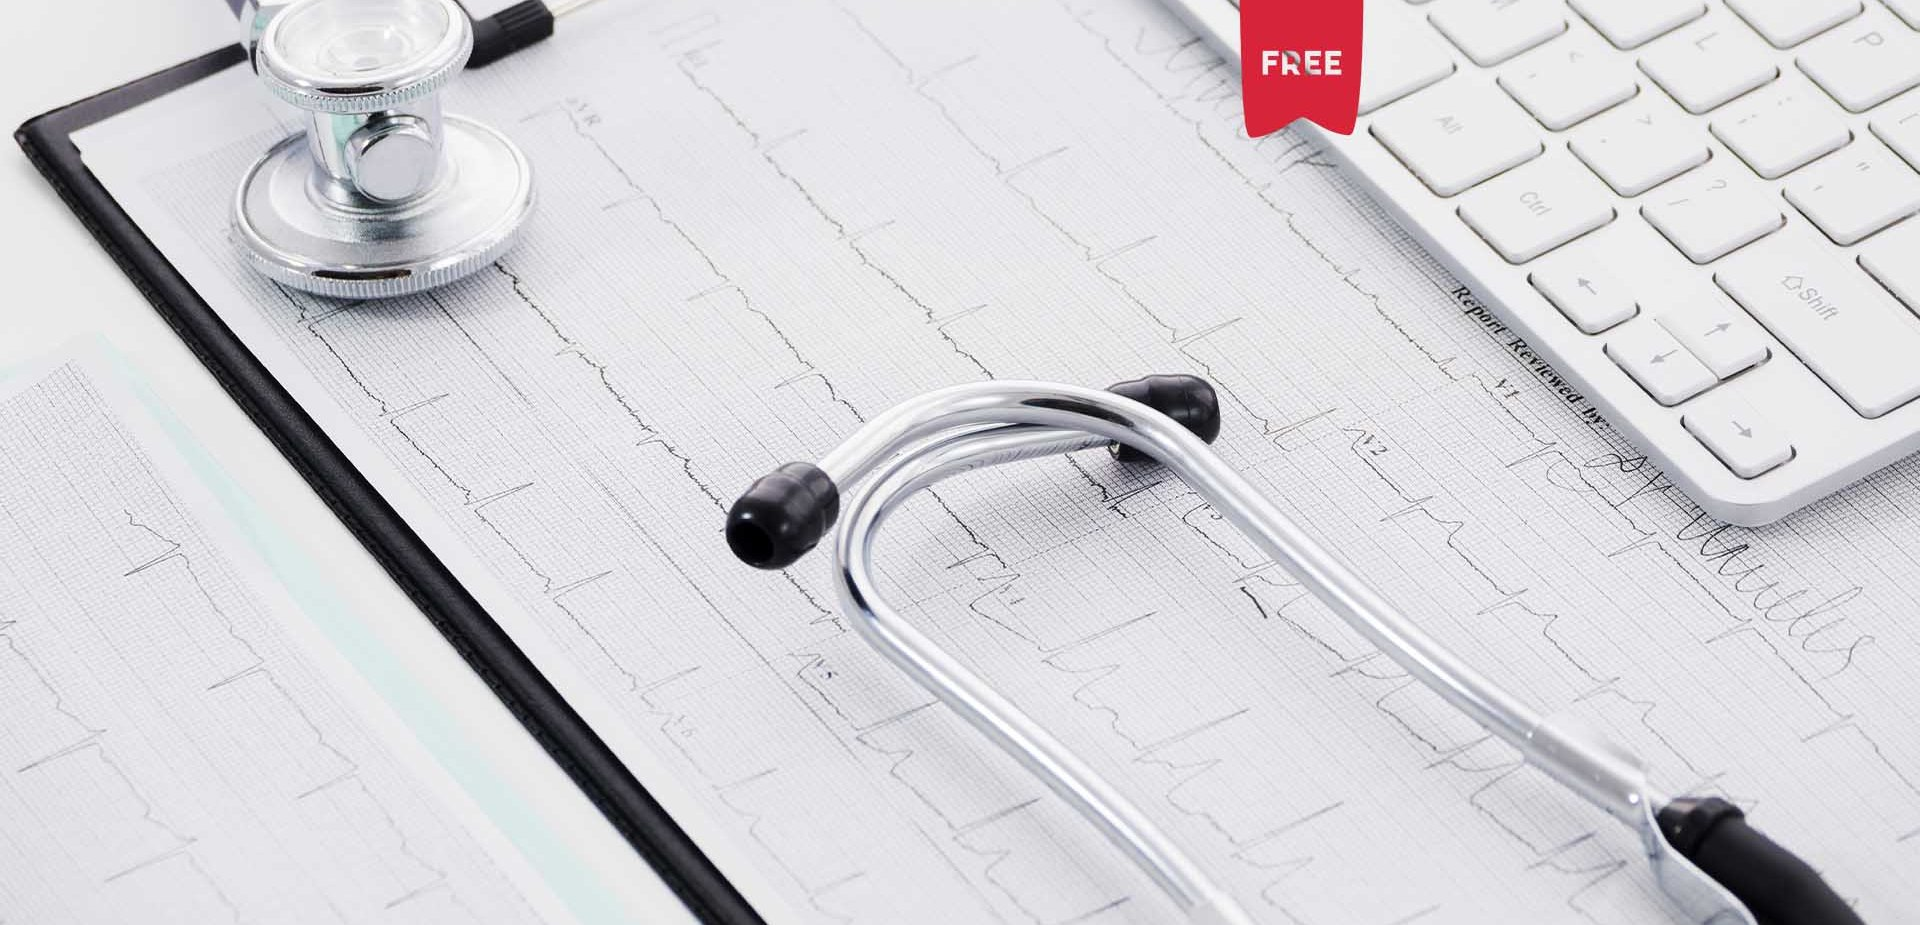 Eletrocardiograma (ECG) cardíaco normal